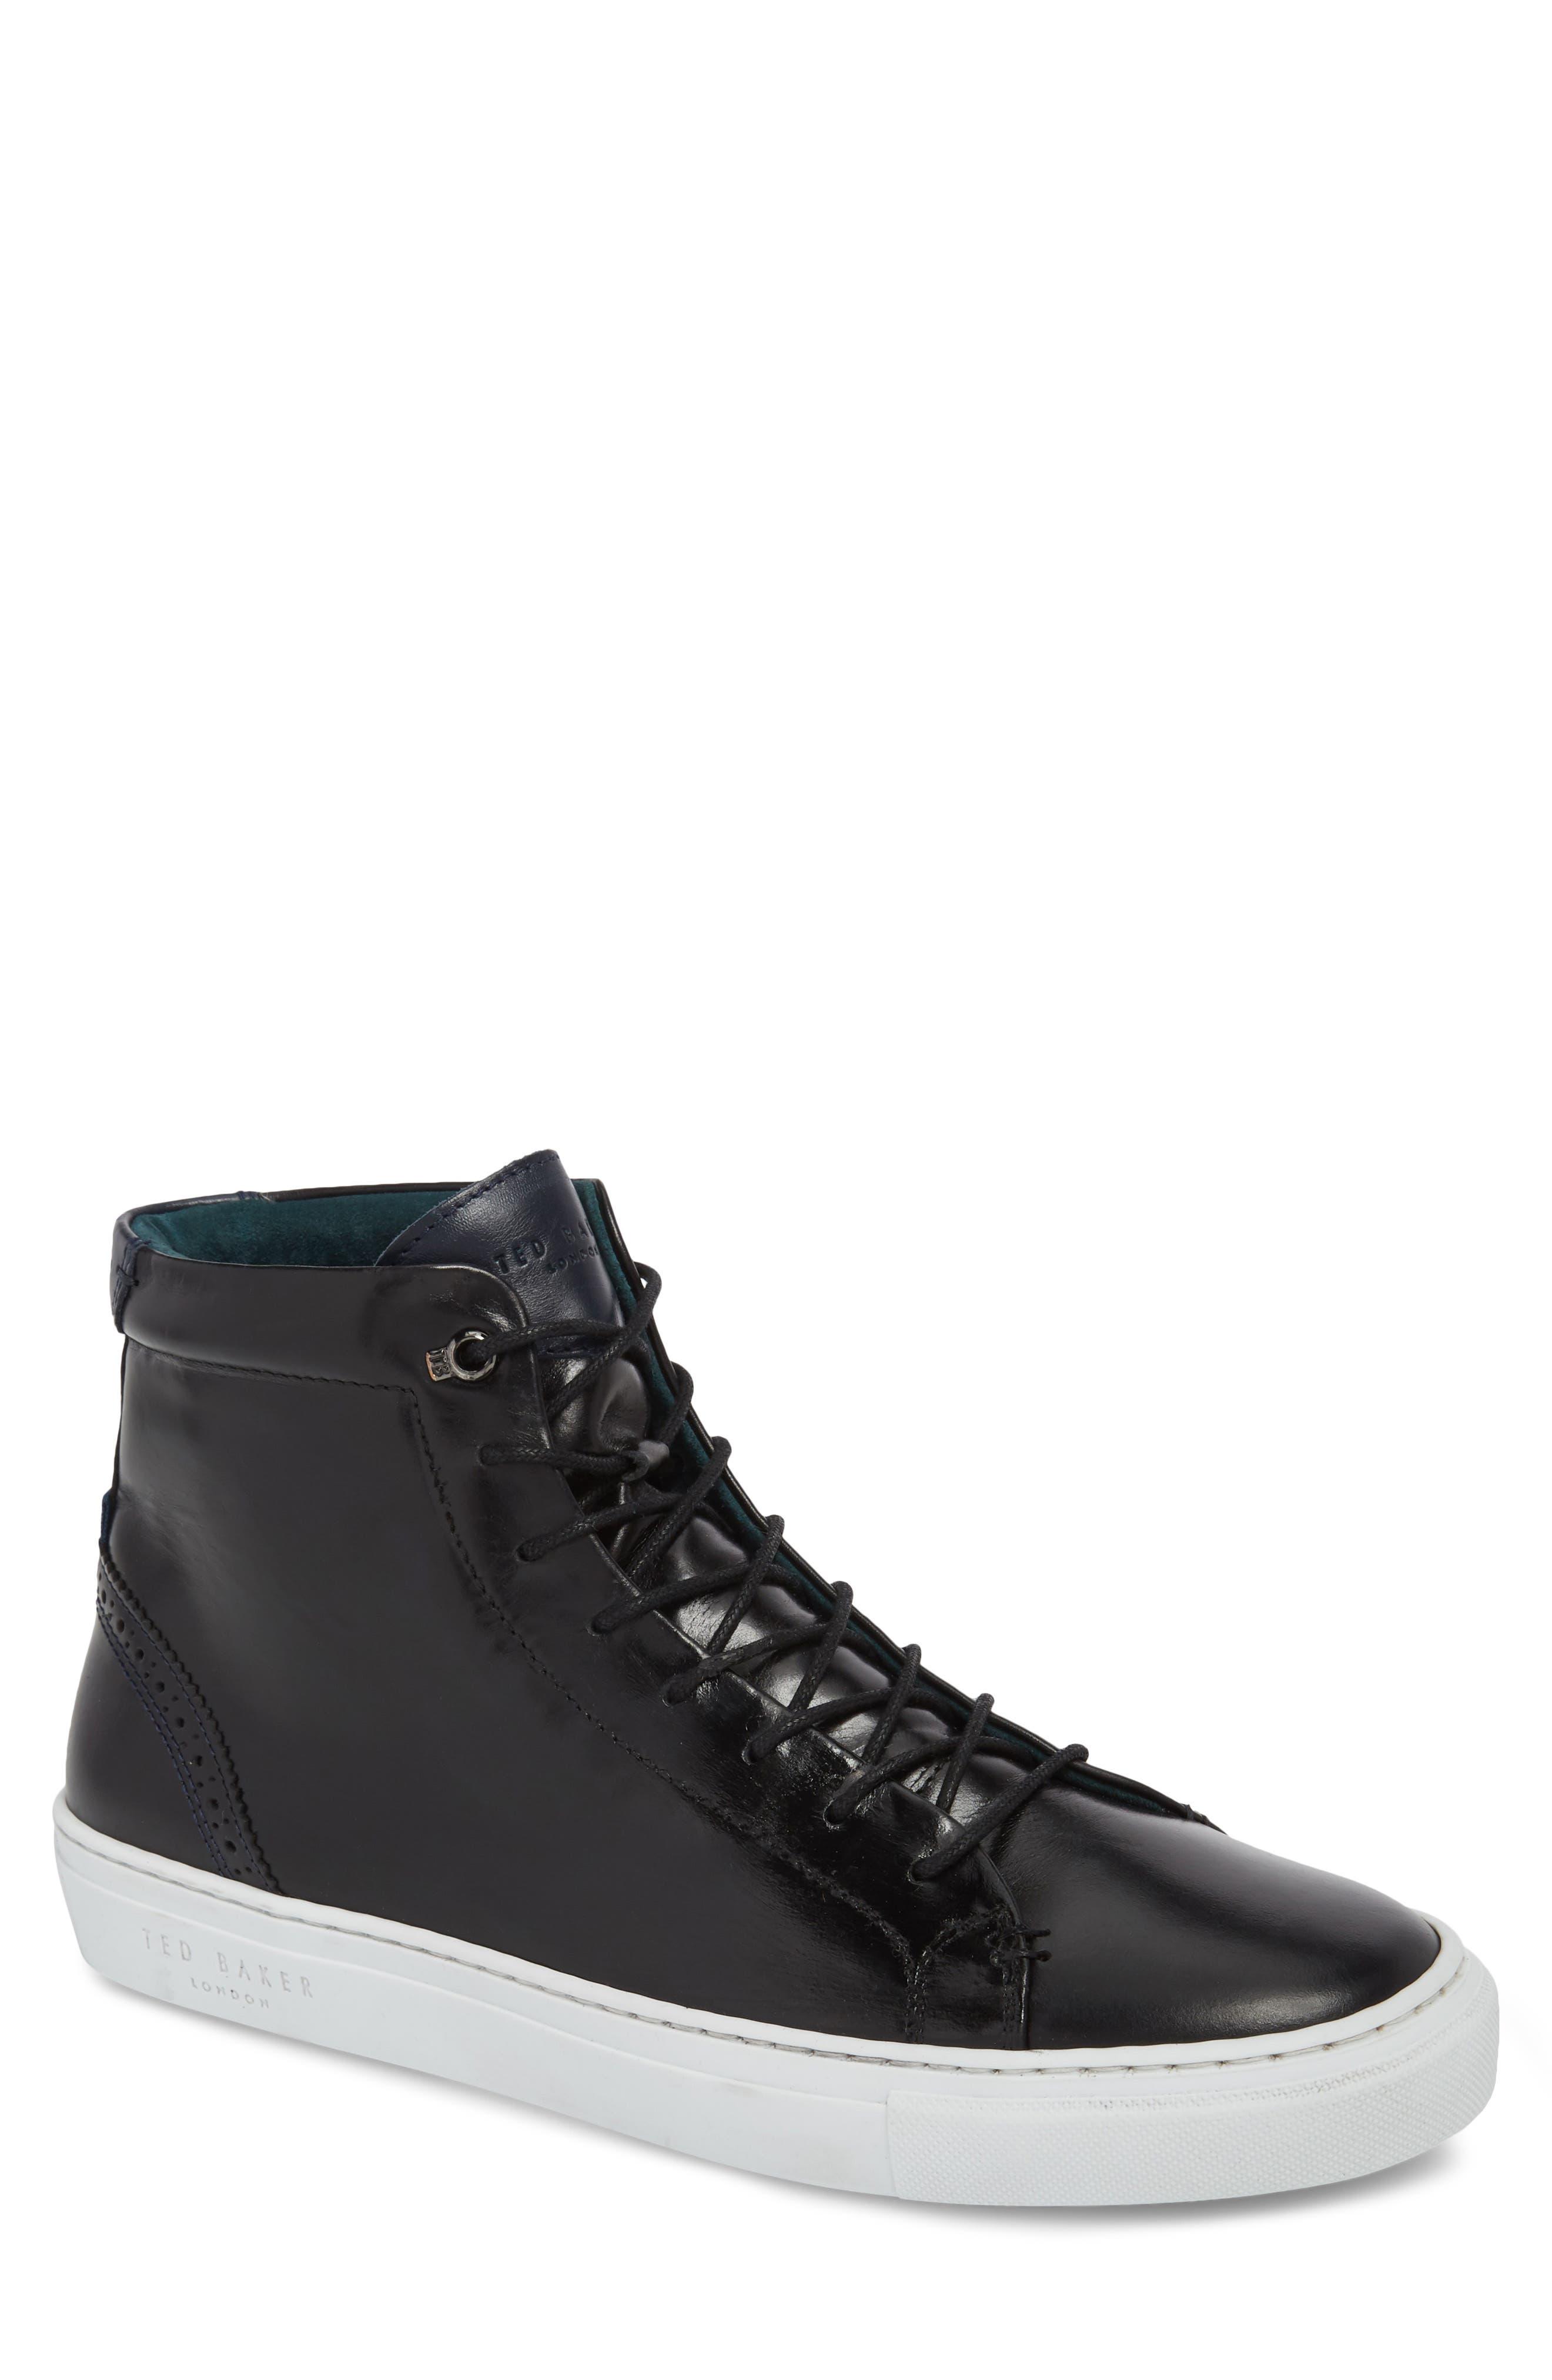 Monerkk High Top Sneaker,                             Main thumbnail 1, color,                             Black Leather